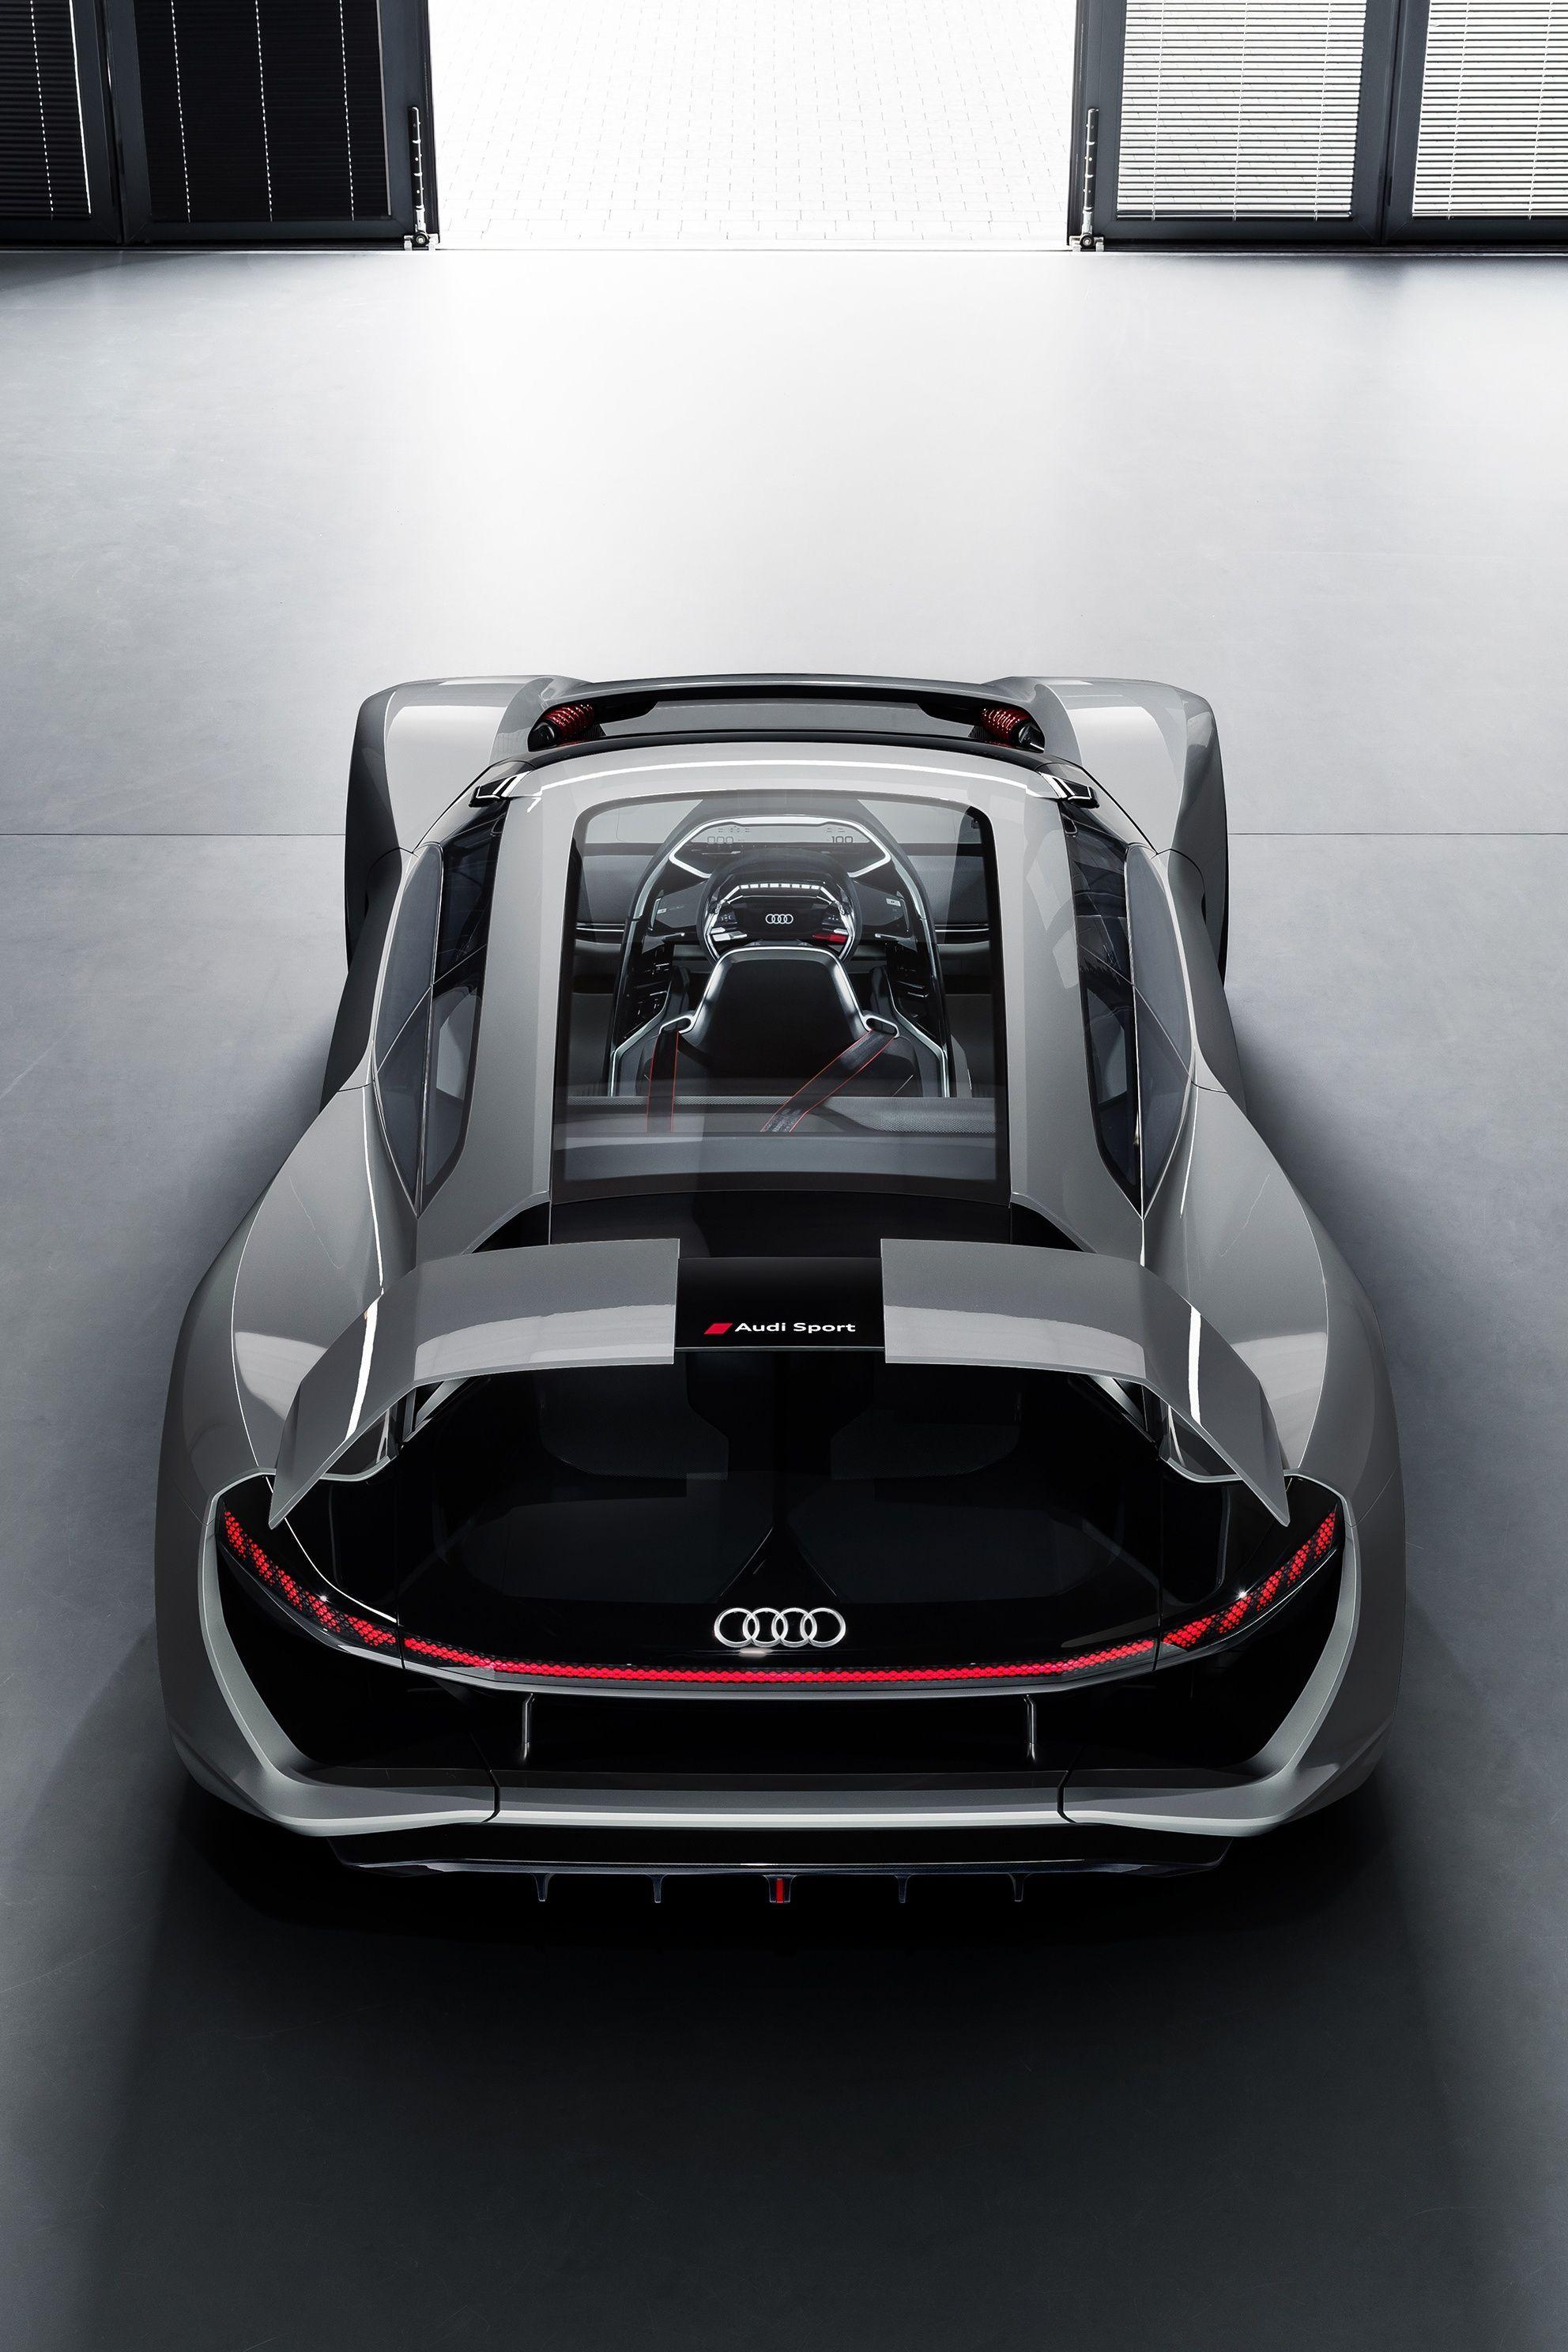 Electric Audi Pb18 E Tron Supercar The Man Audi Ev Supercar Super Cars Super Luxury Cars Audi E Tron